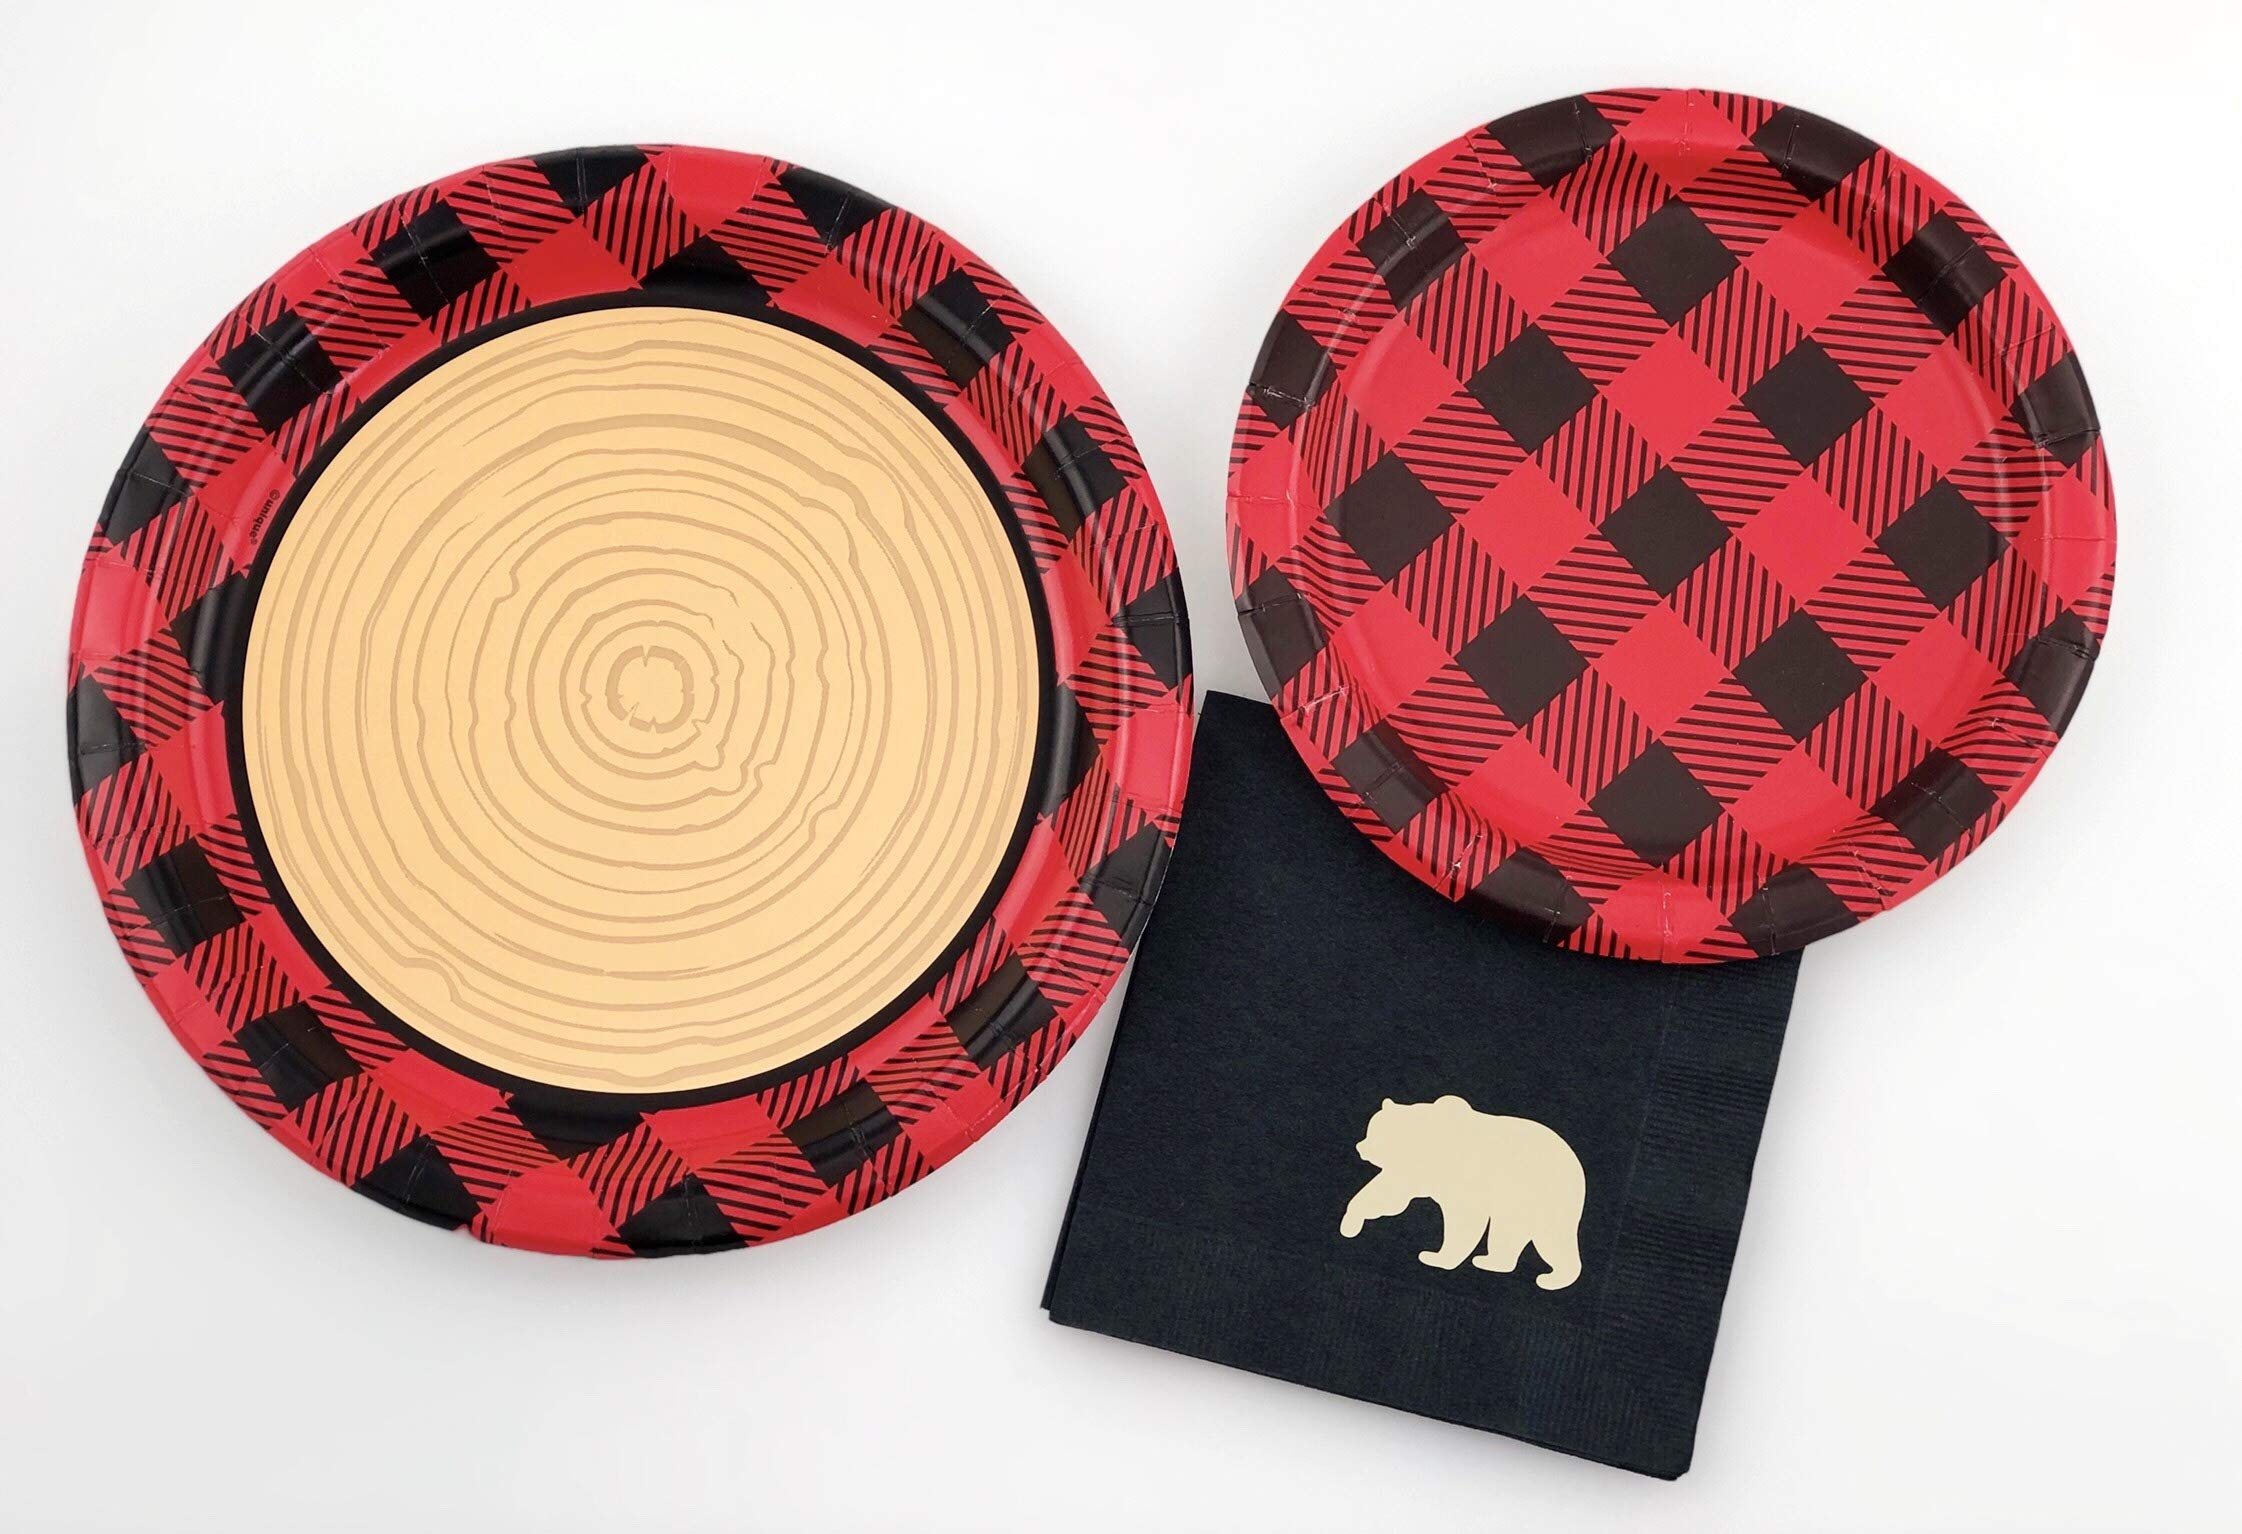 Buffalo Plaid Party Set - 16 Plates Napkins Lumberjack Birthday Bear Baby Shower by Stesha Party (Image #1)